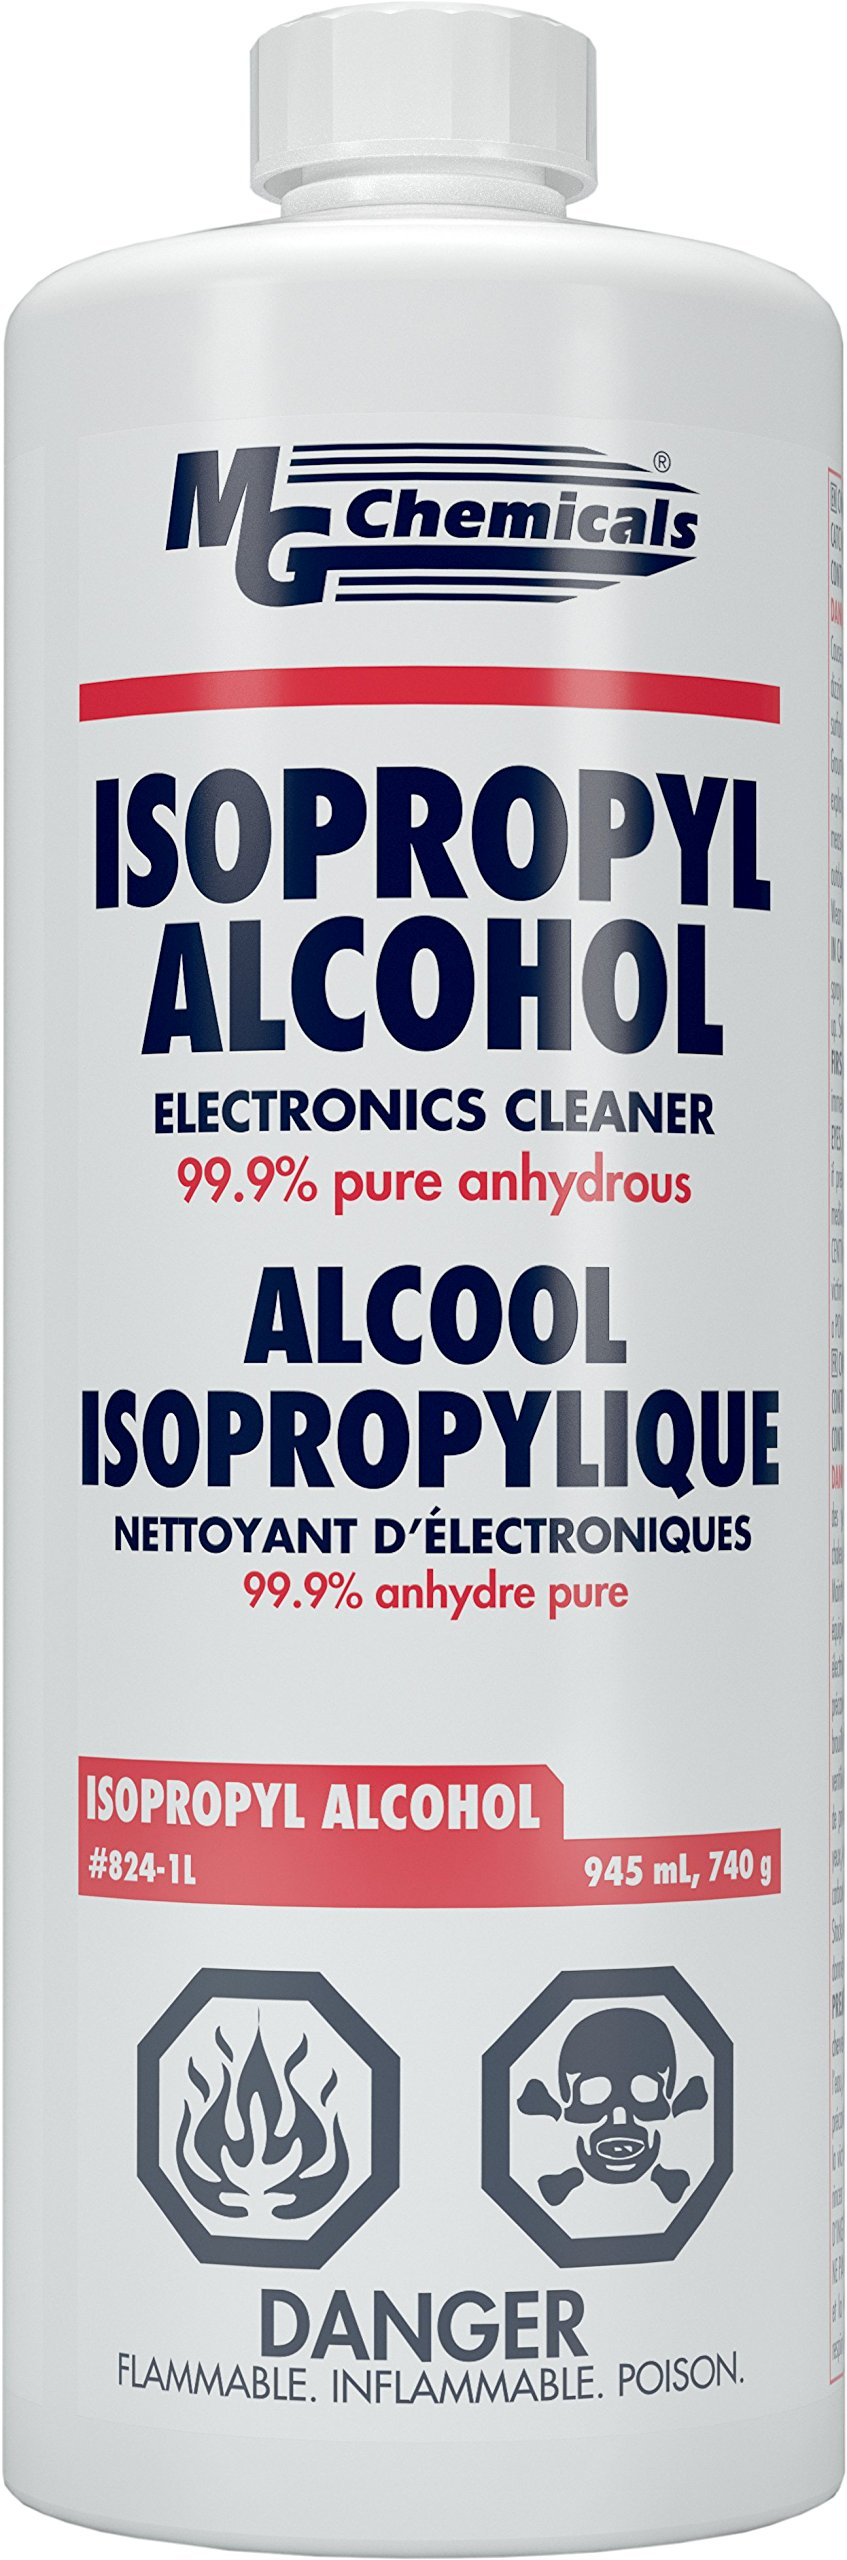 MG Chemicals 824-1L 99.9% Isopropyl Alcohol Liquid Cleaner, Clear, 945 mL (1 US Quart)